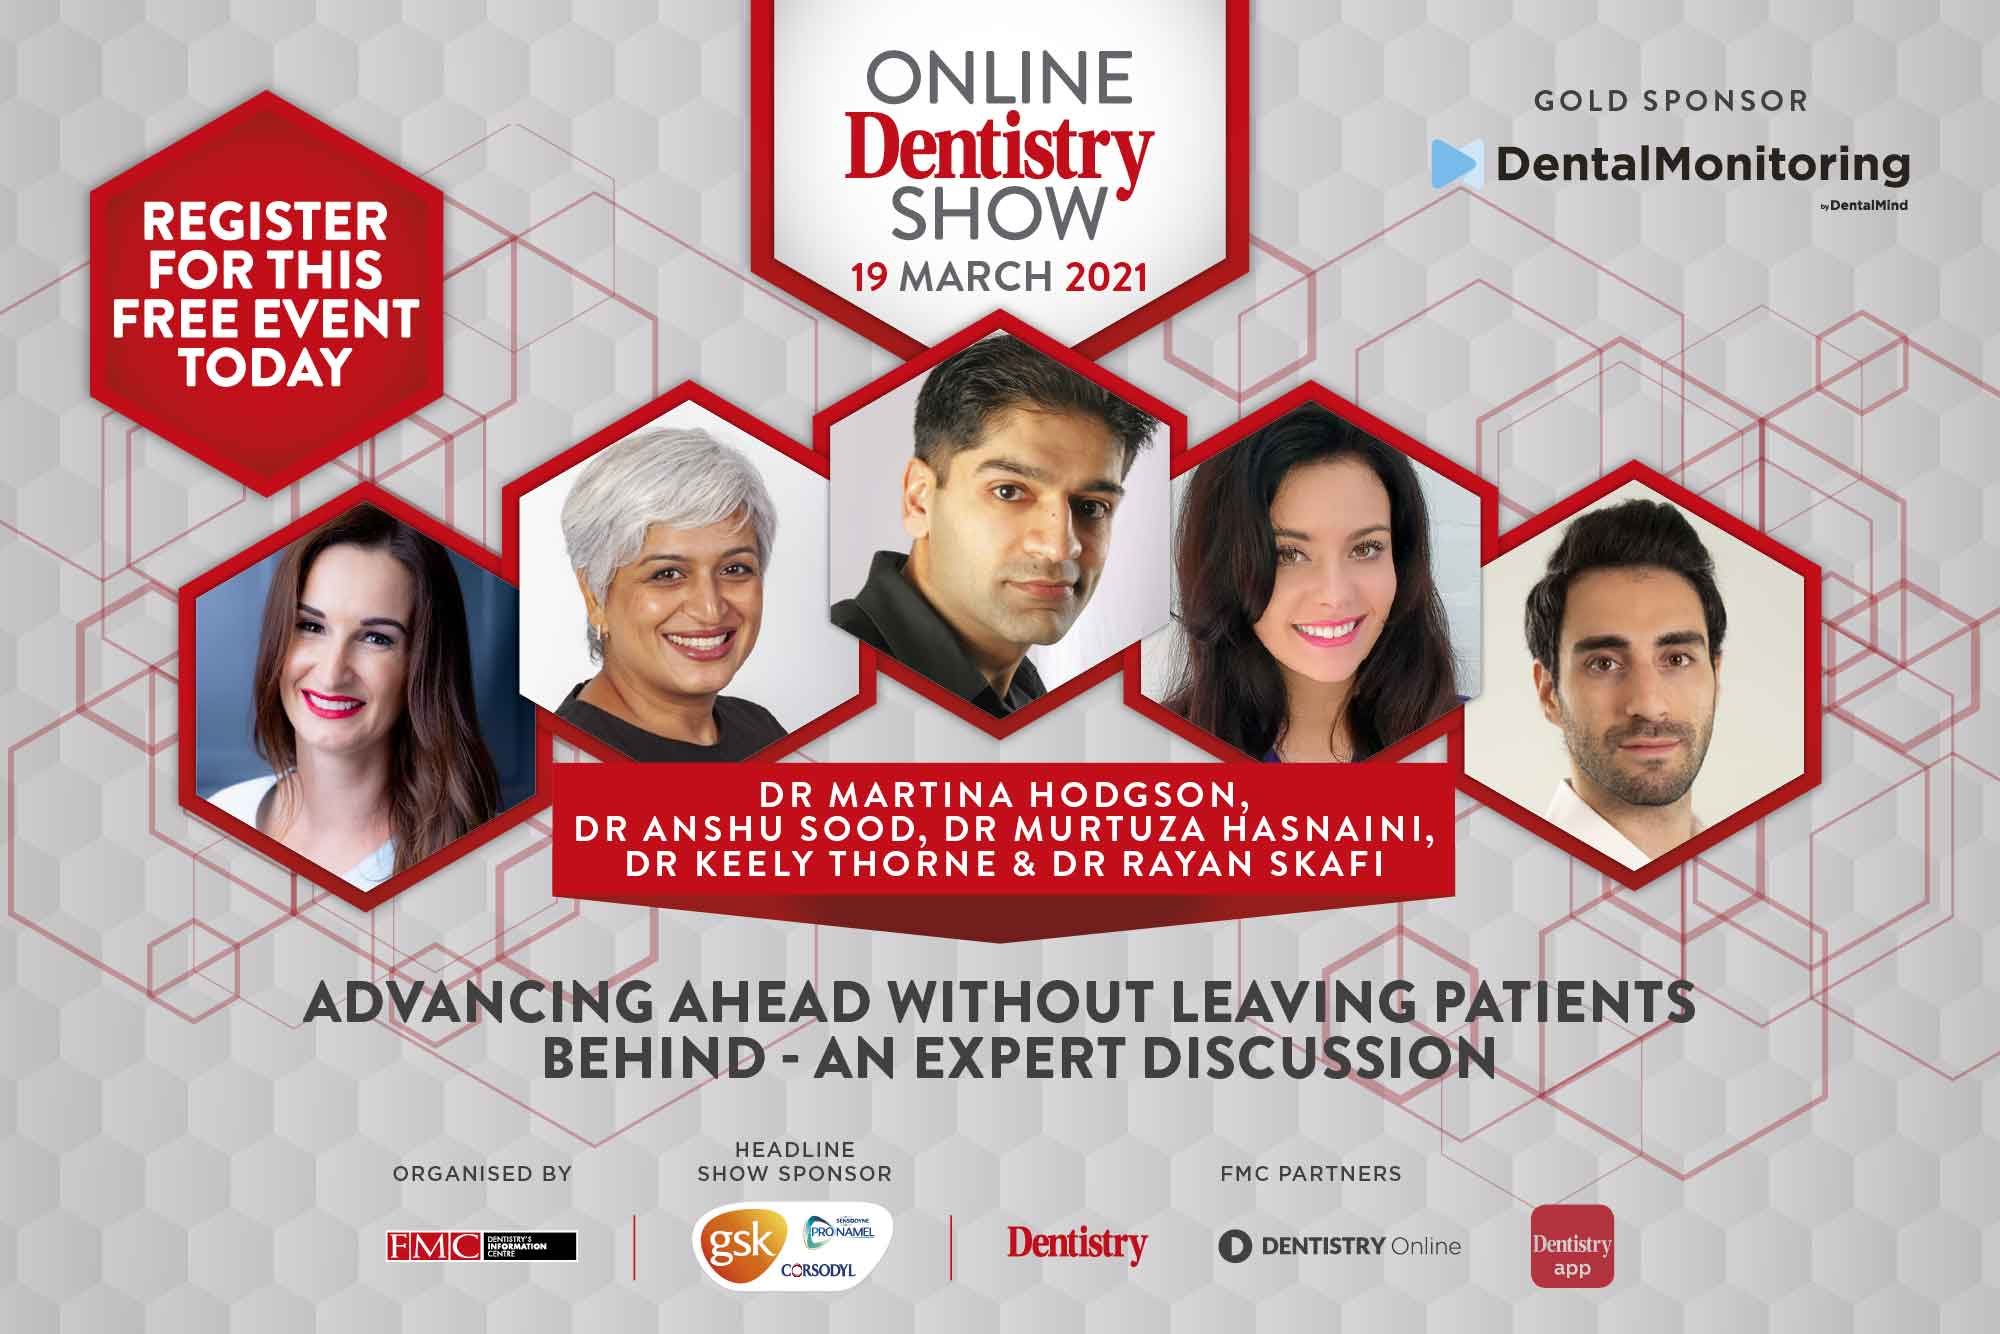 online dentistry show dental monitoring